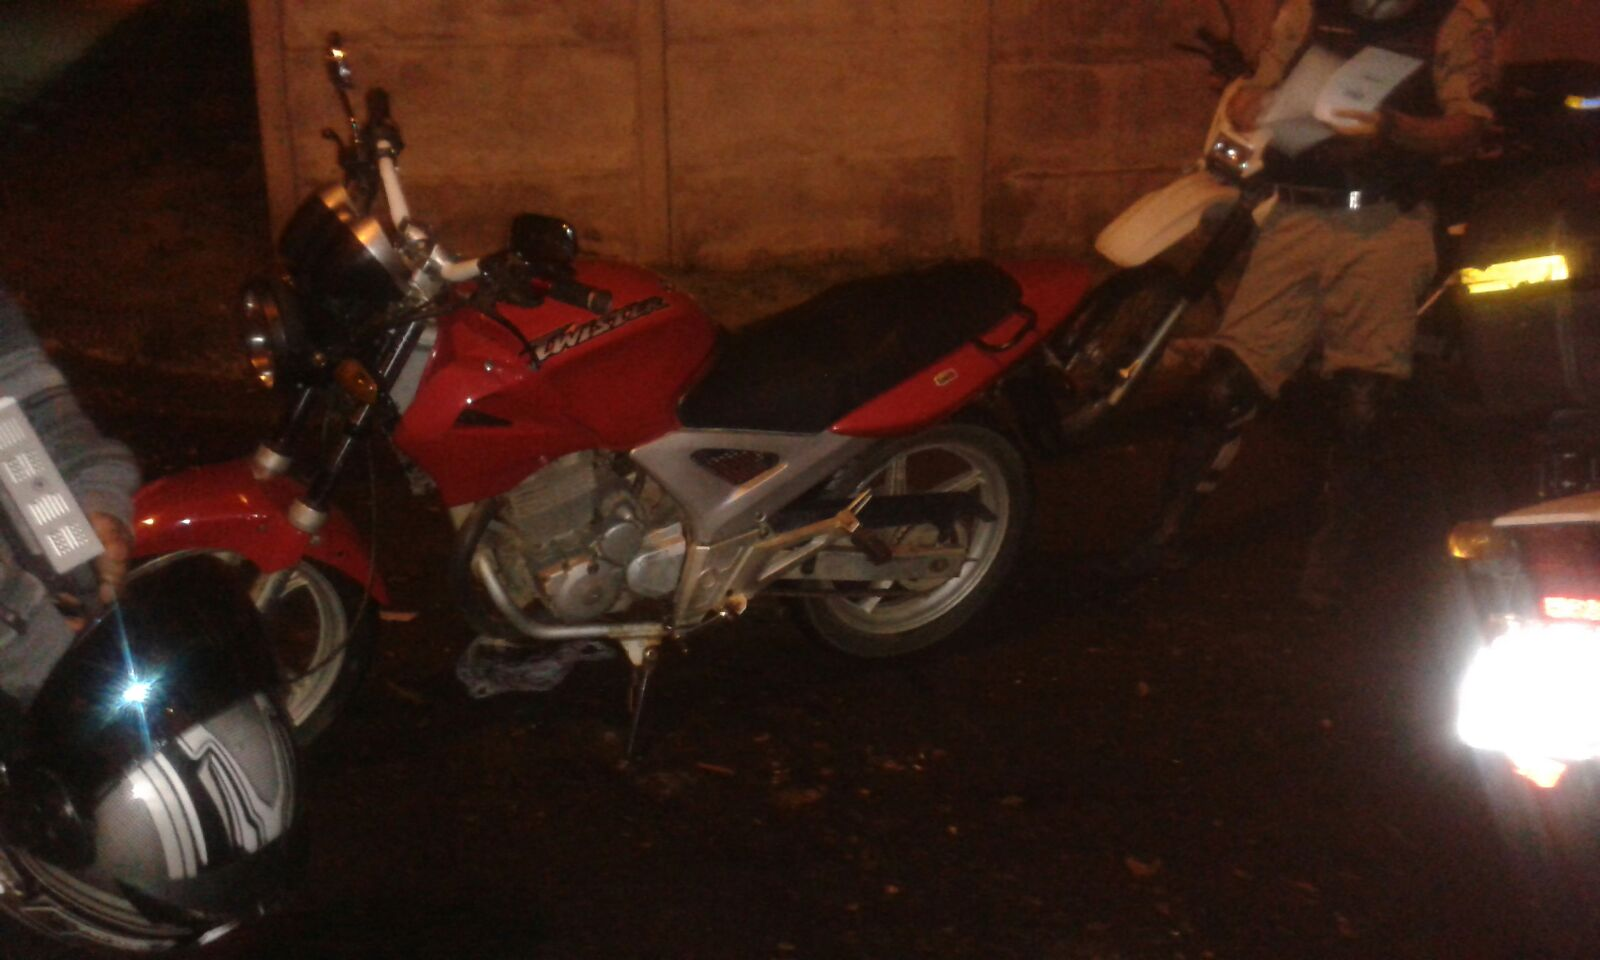 02 moto sjderei